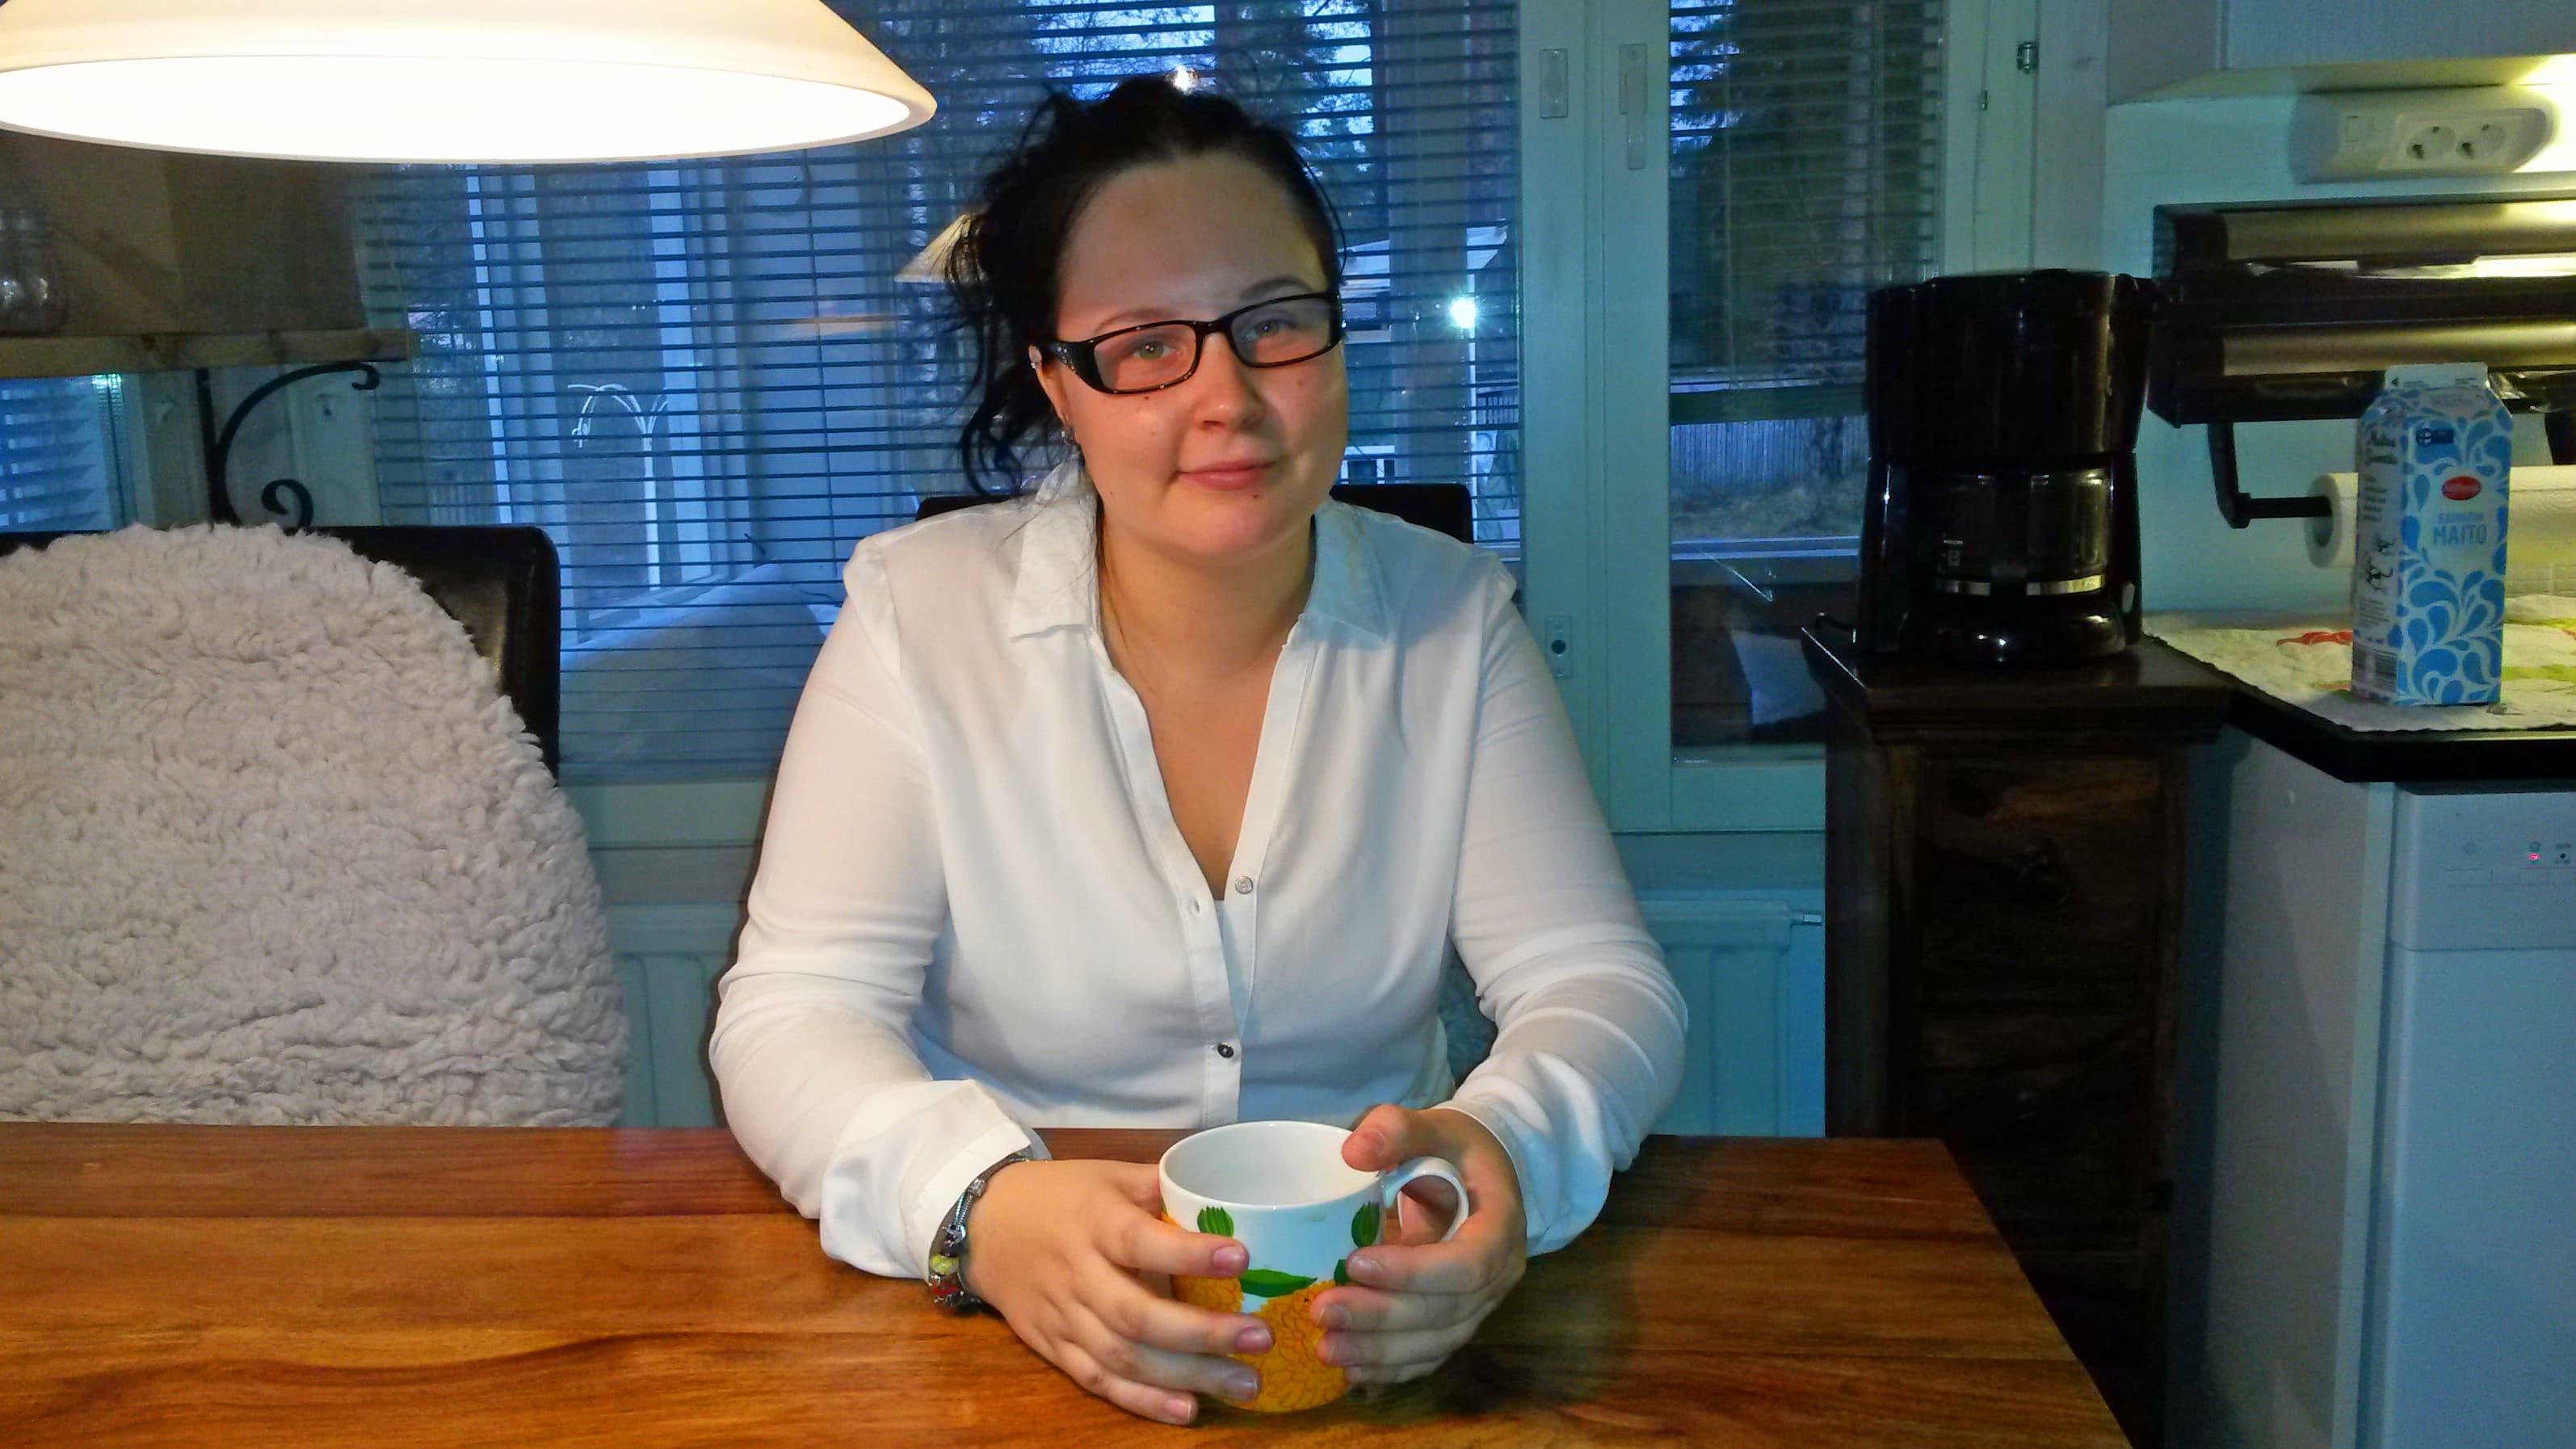 Satu Söderholm istuu kotinsa pöydän ääressä kahvikuppi kädessään